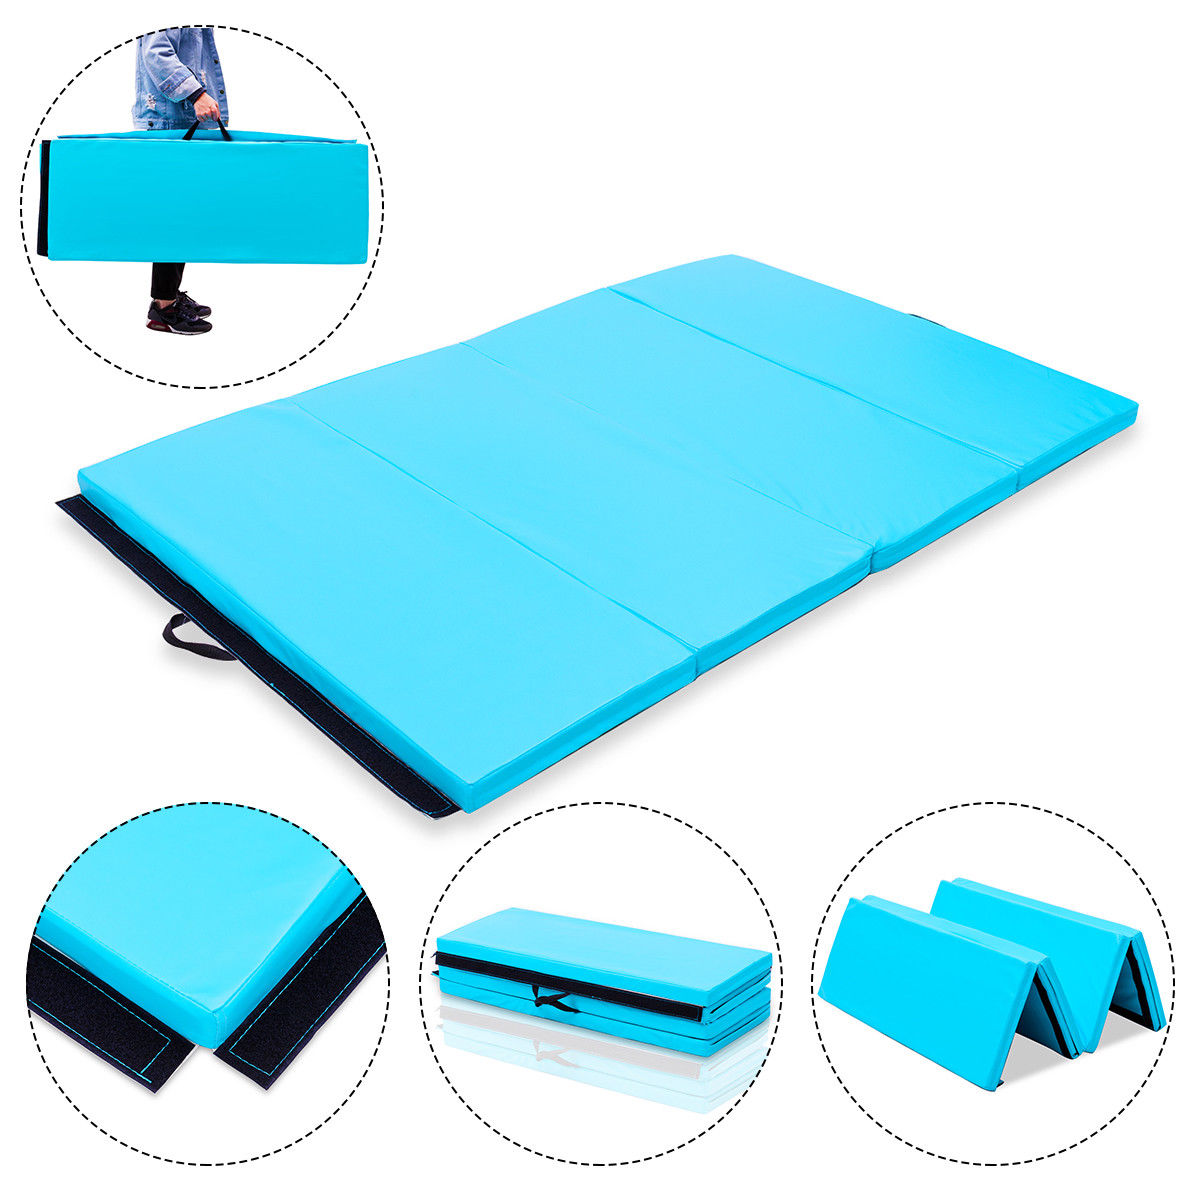 Costway 4'x6'x2'' Gymnastics Mat PU Thick Folding Panel Gym Fitness Exercise Blue